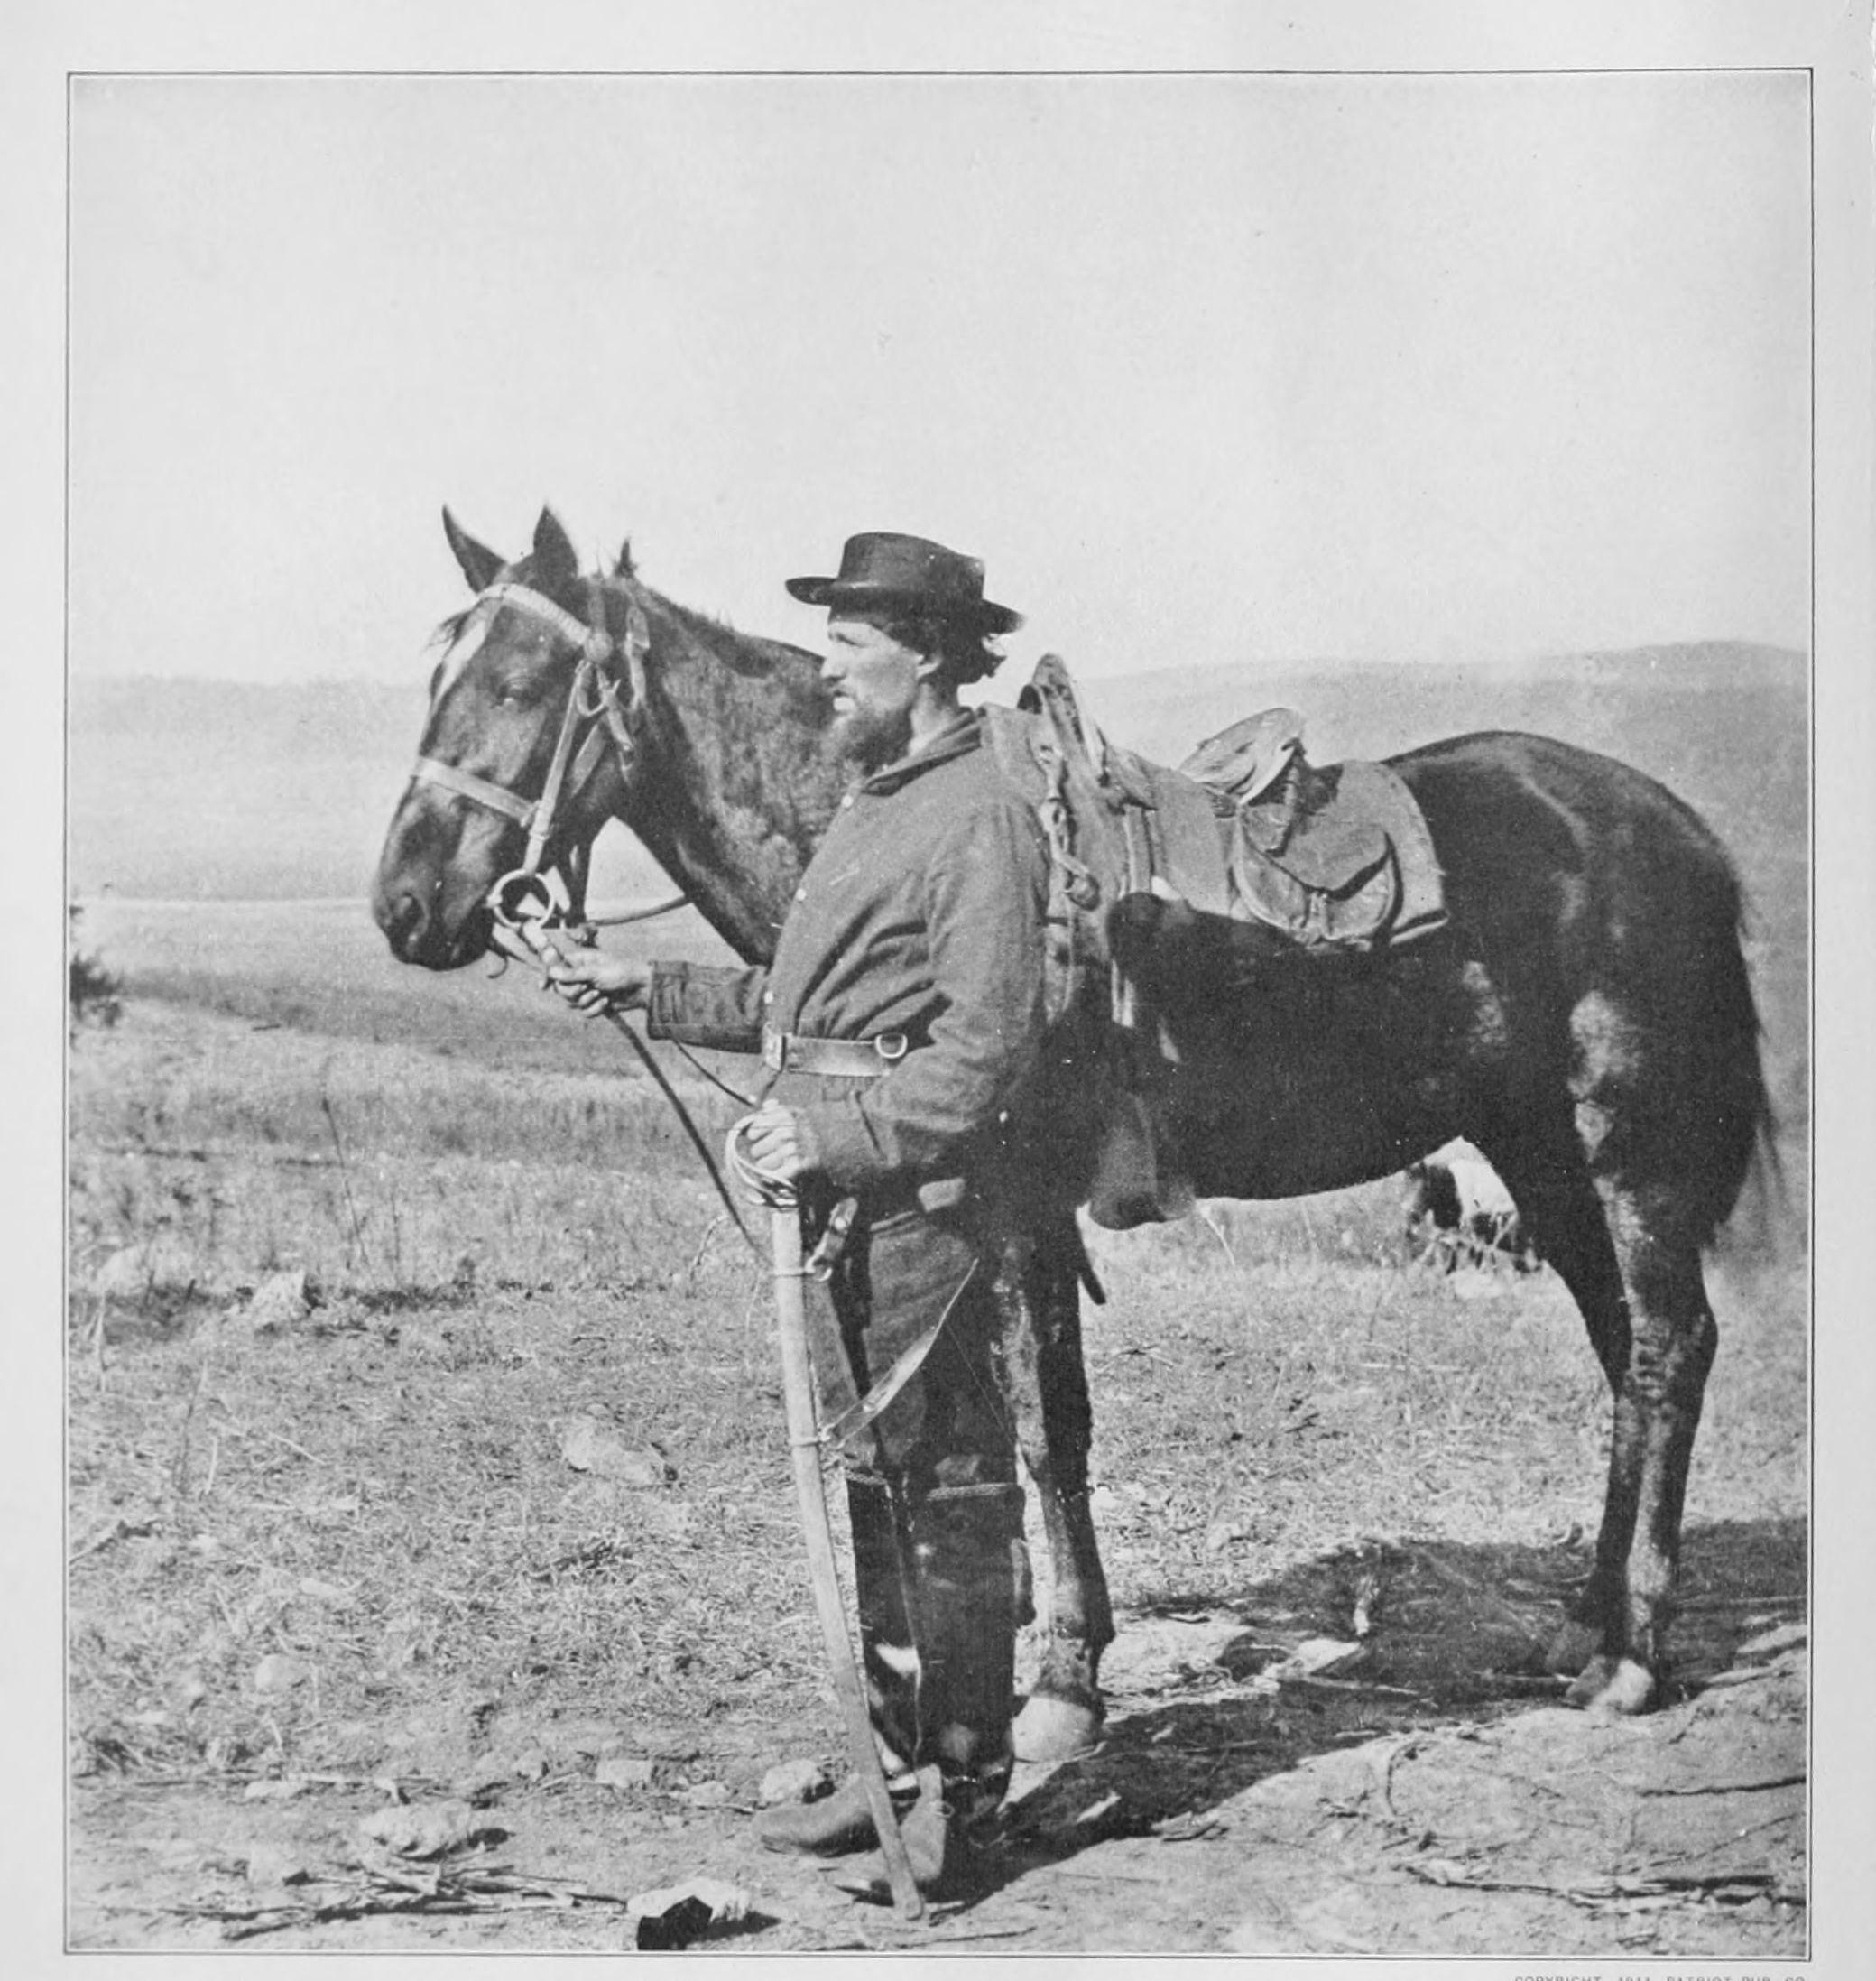 Union Cavalryman from 1862